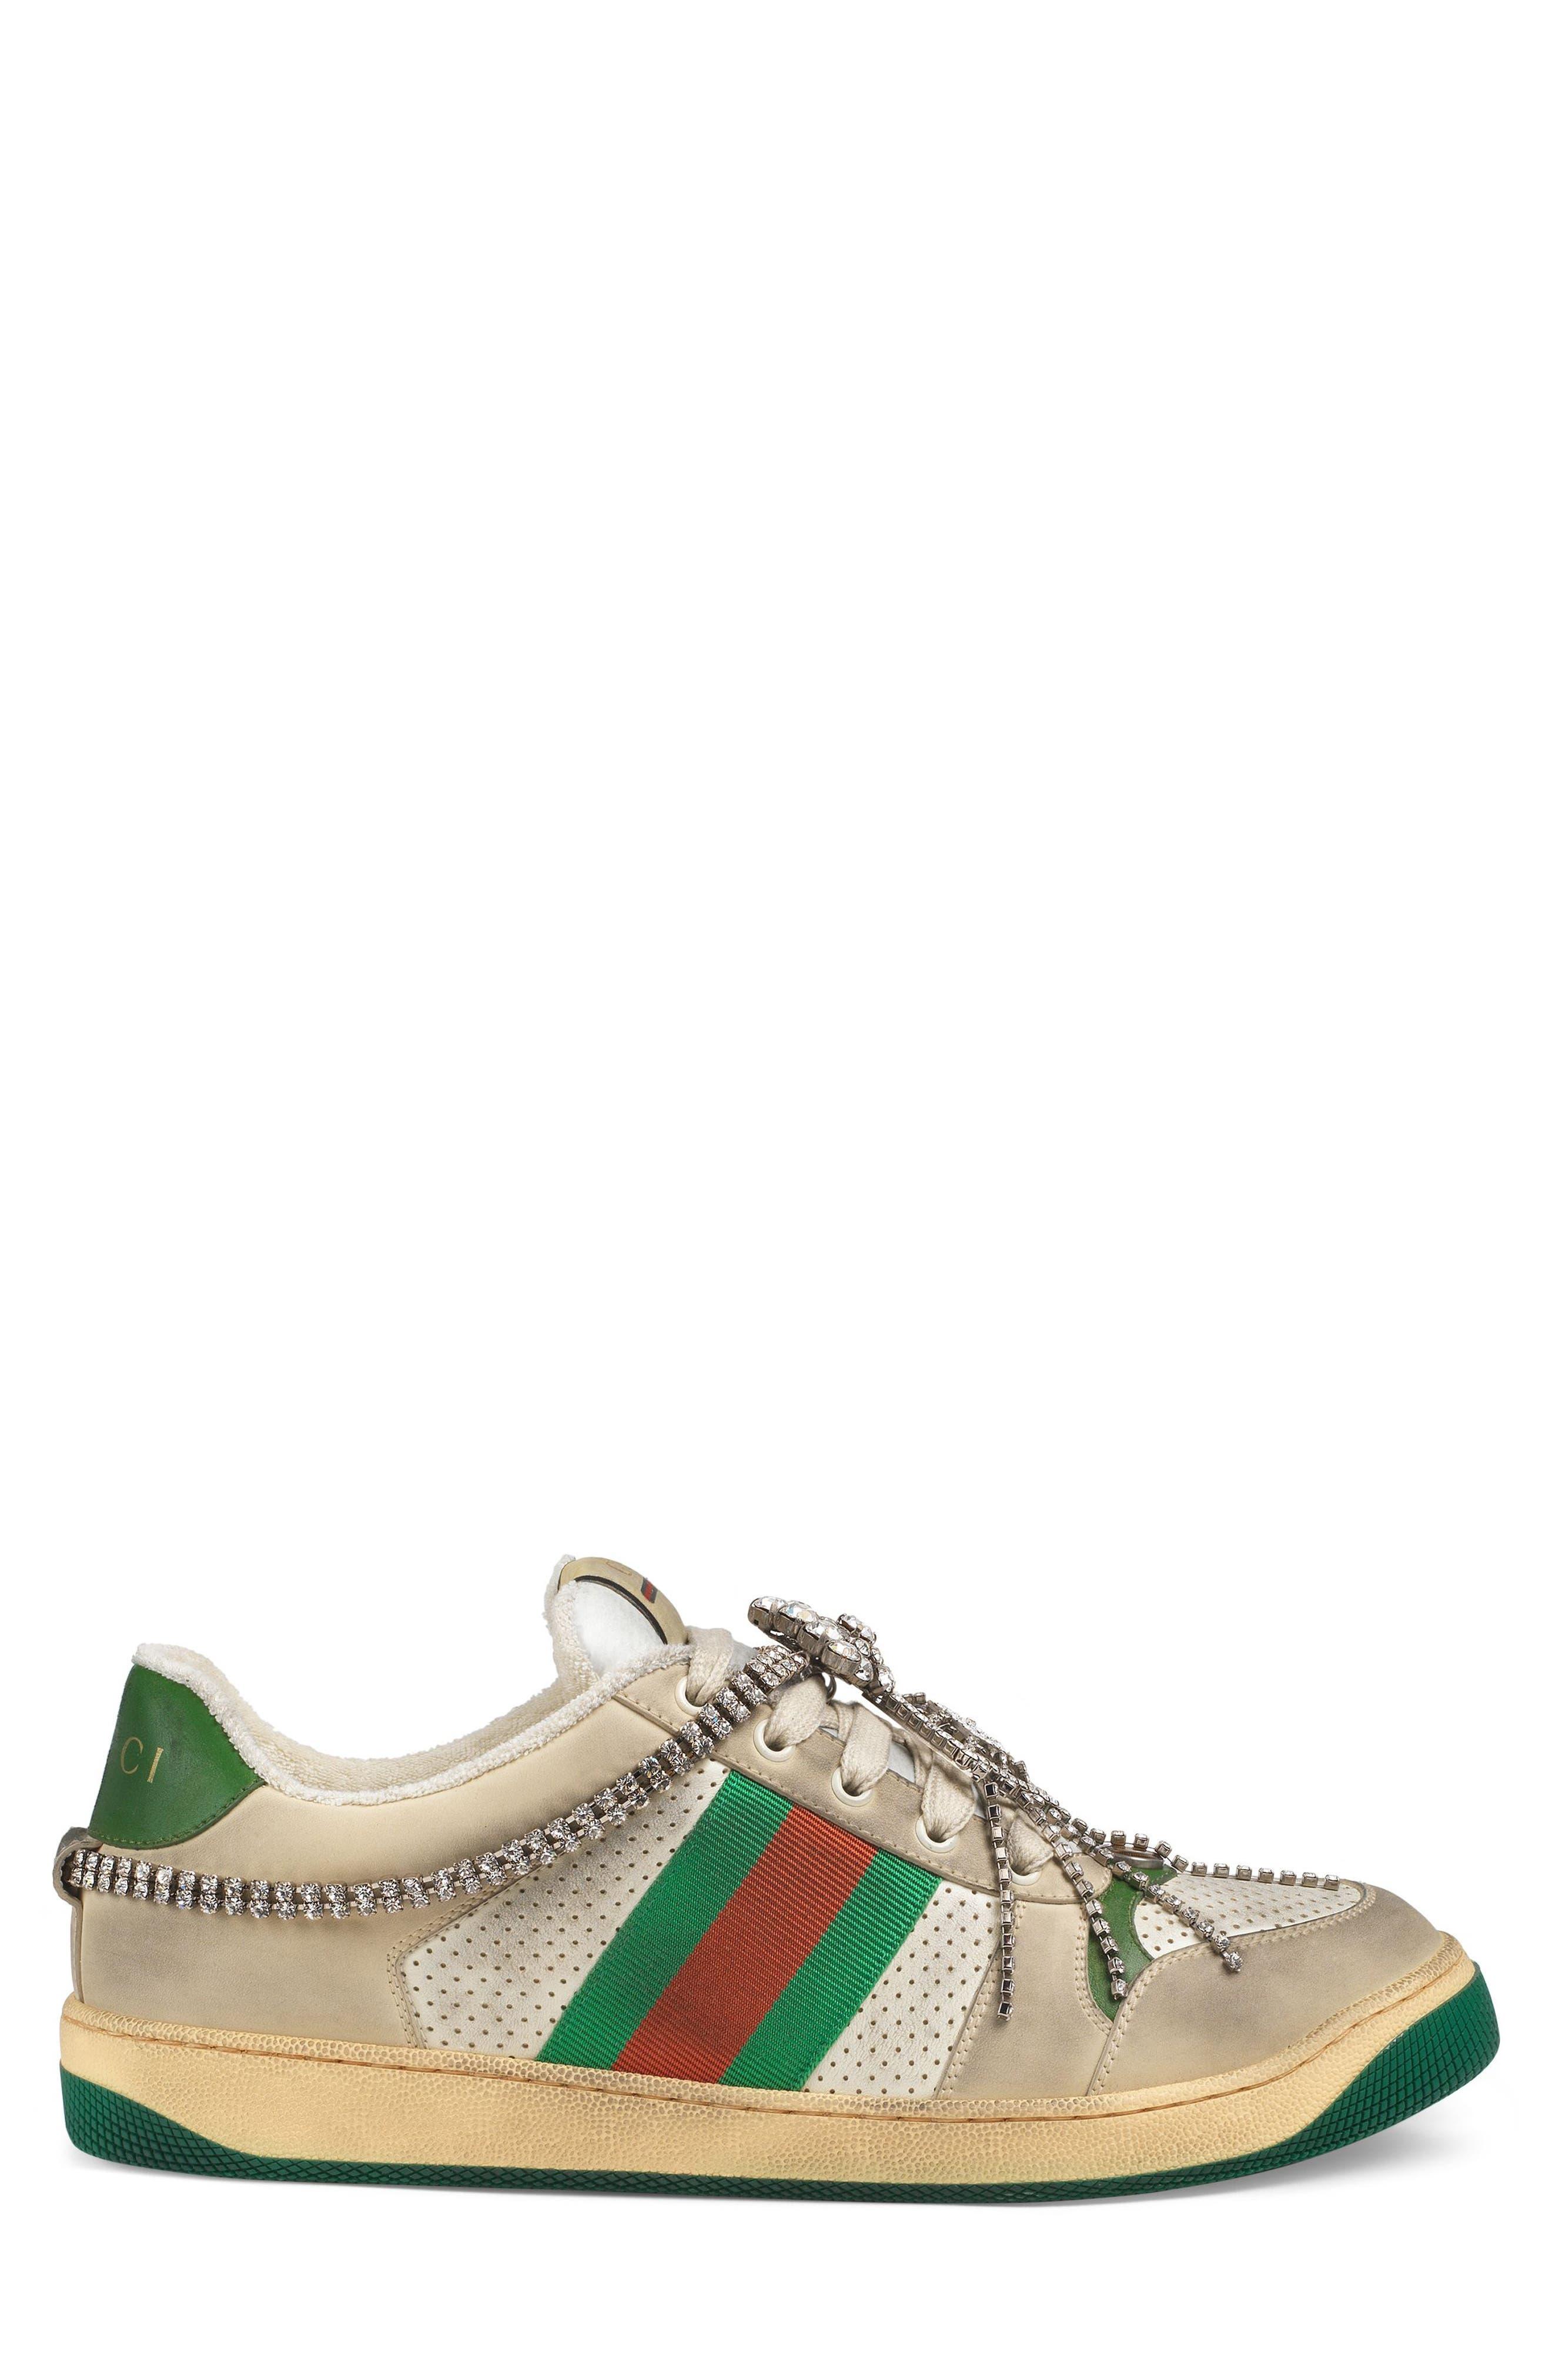 Screener Jewel Sneaker,                             Alternate thumbnail 3, color,                             BEIGE/ GREEN/ RED